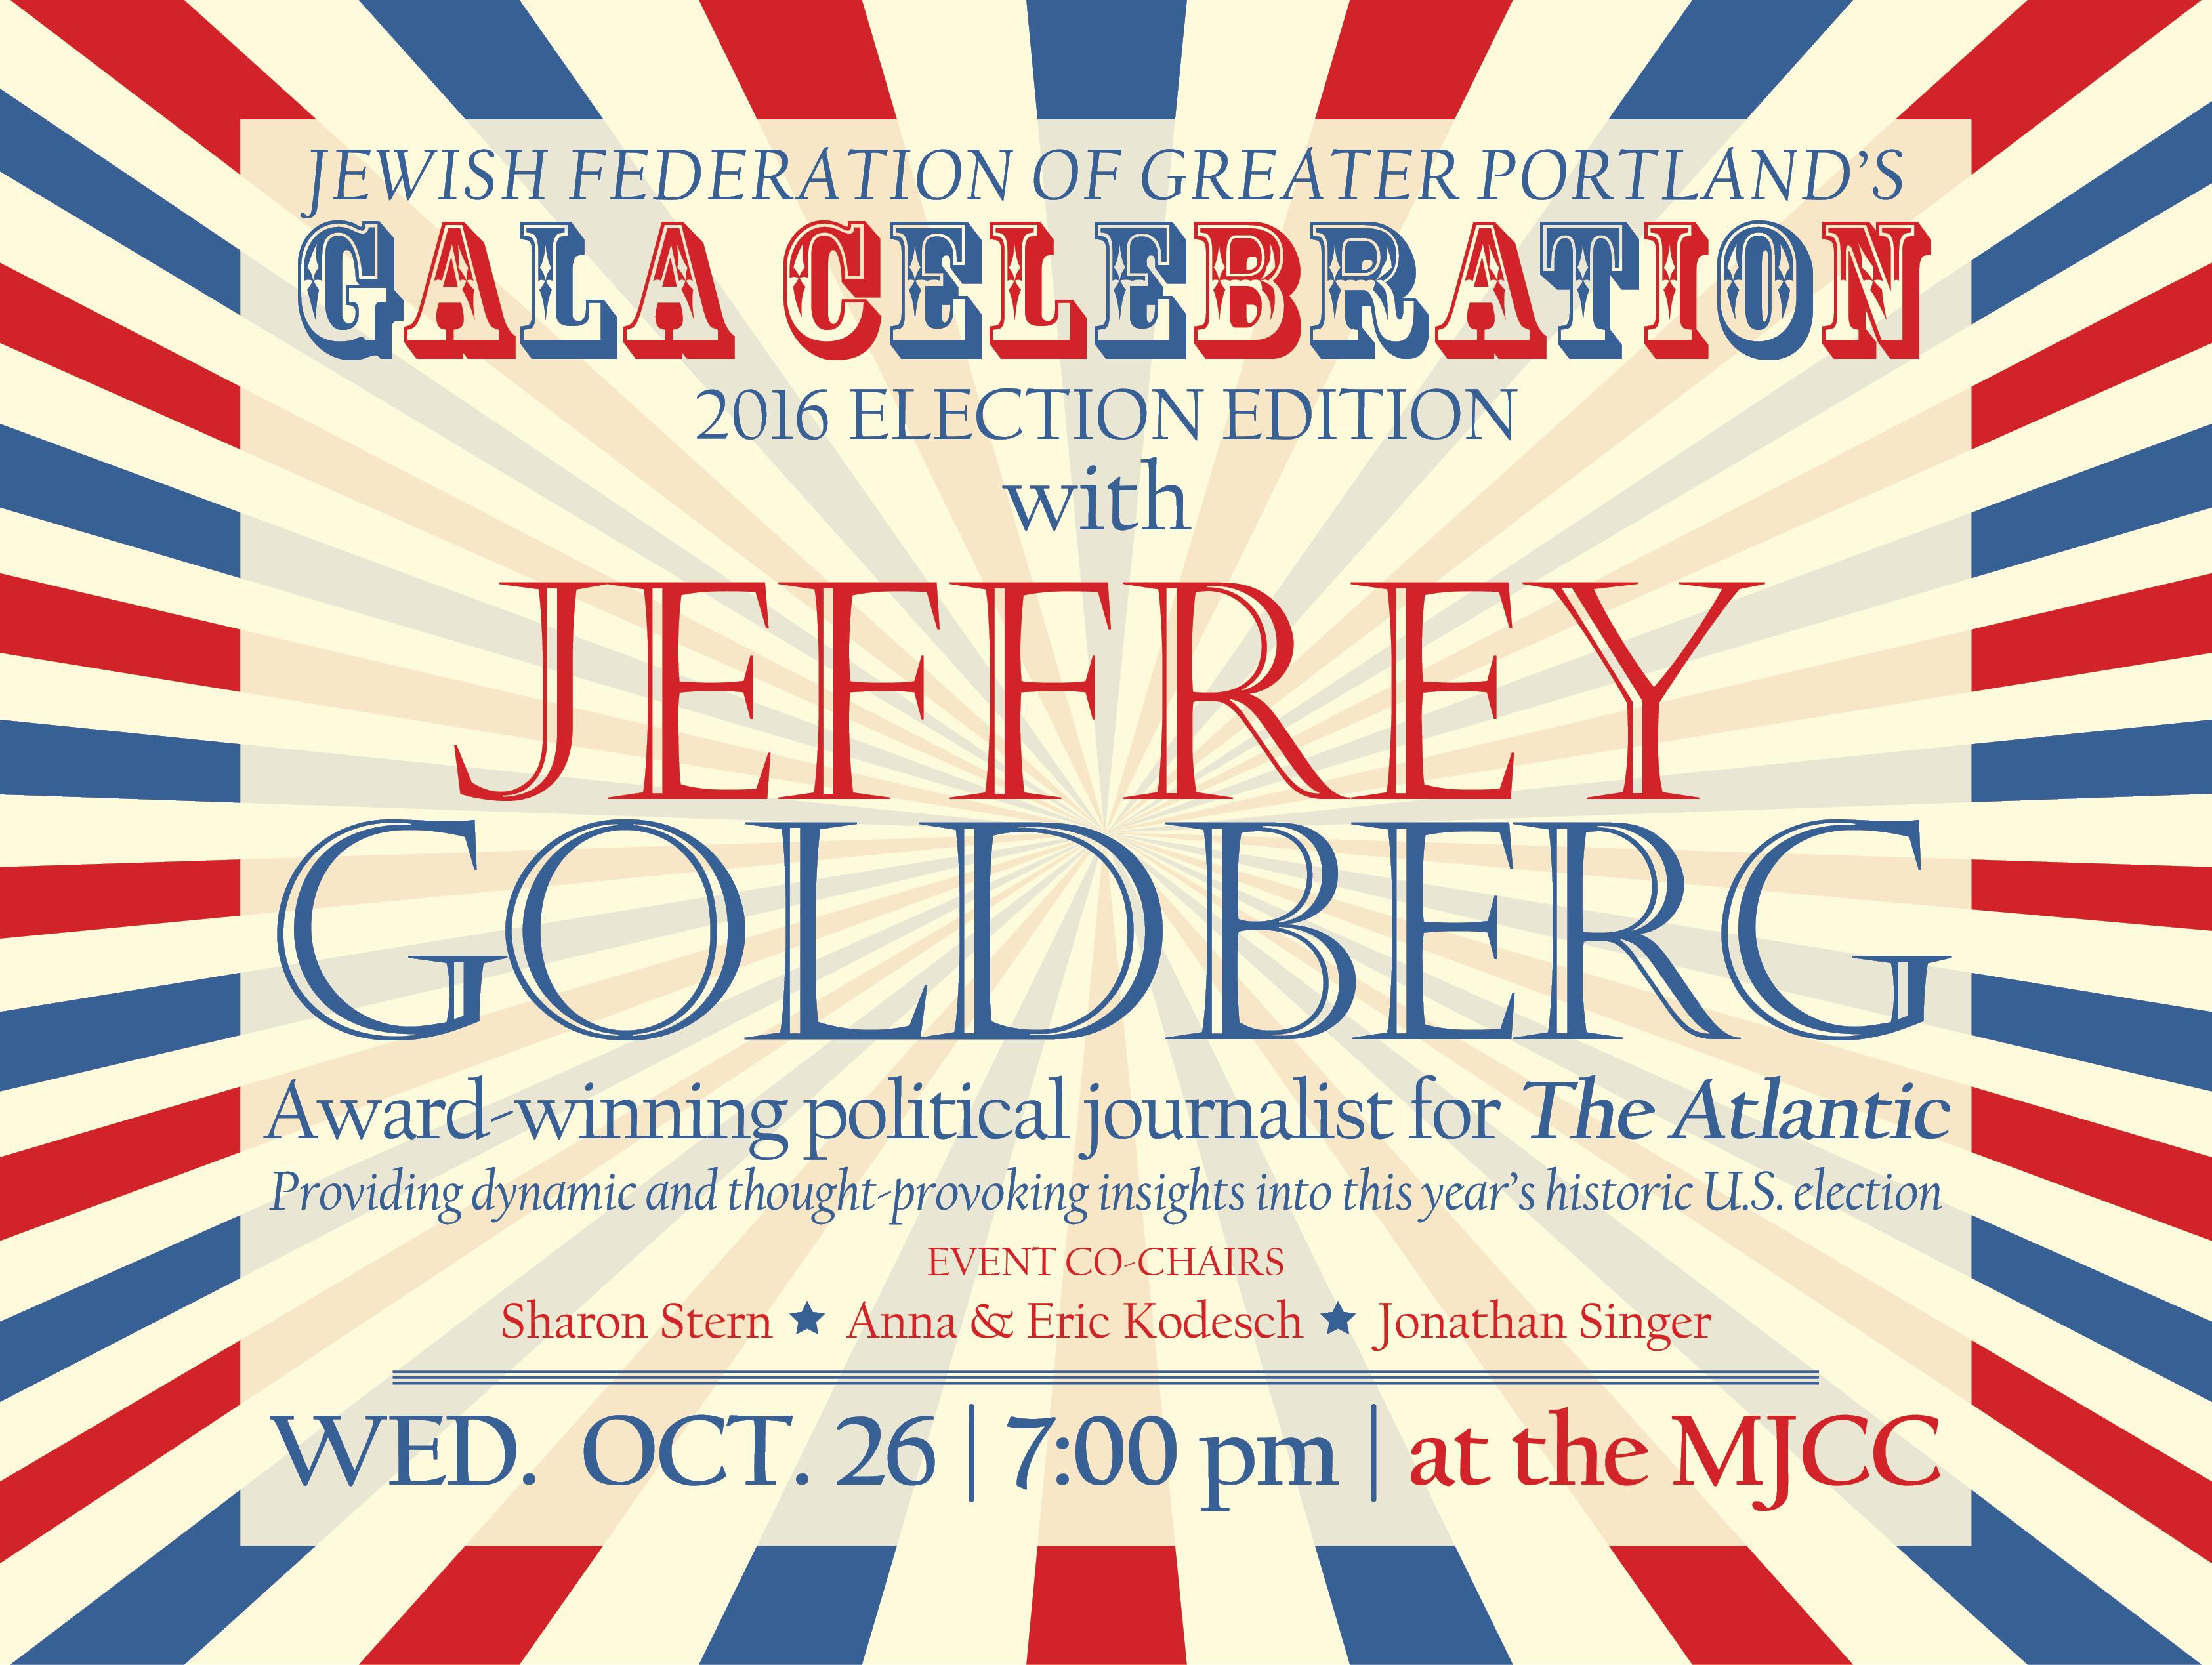 Jewish Federation Gala with Jeffrey Goldberg